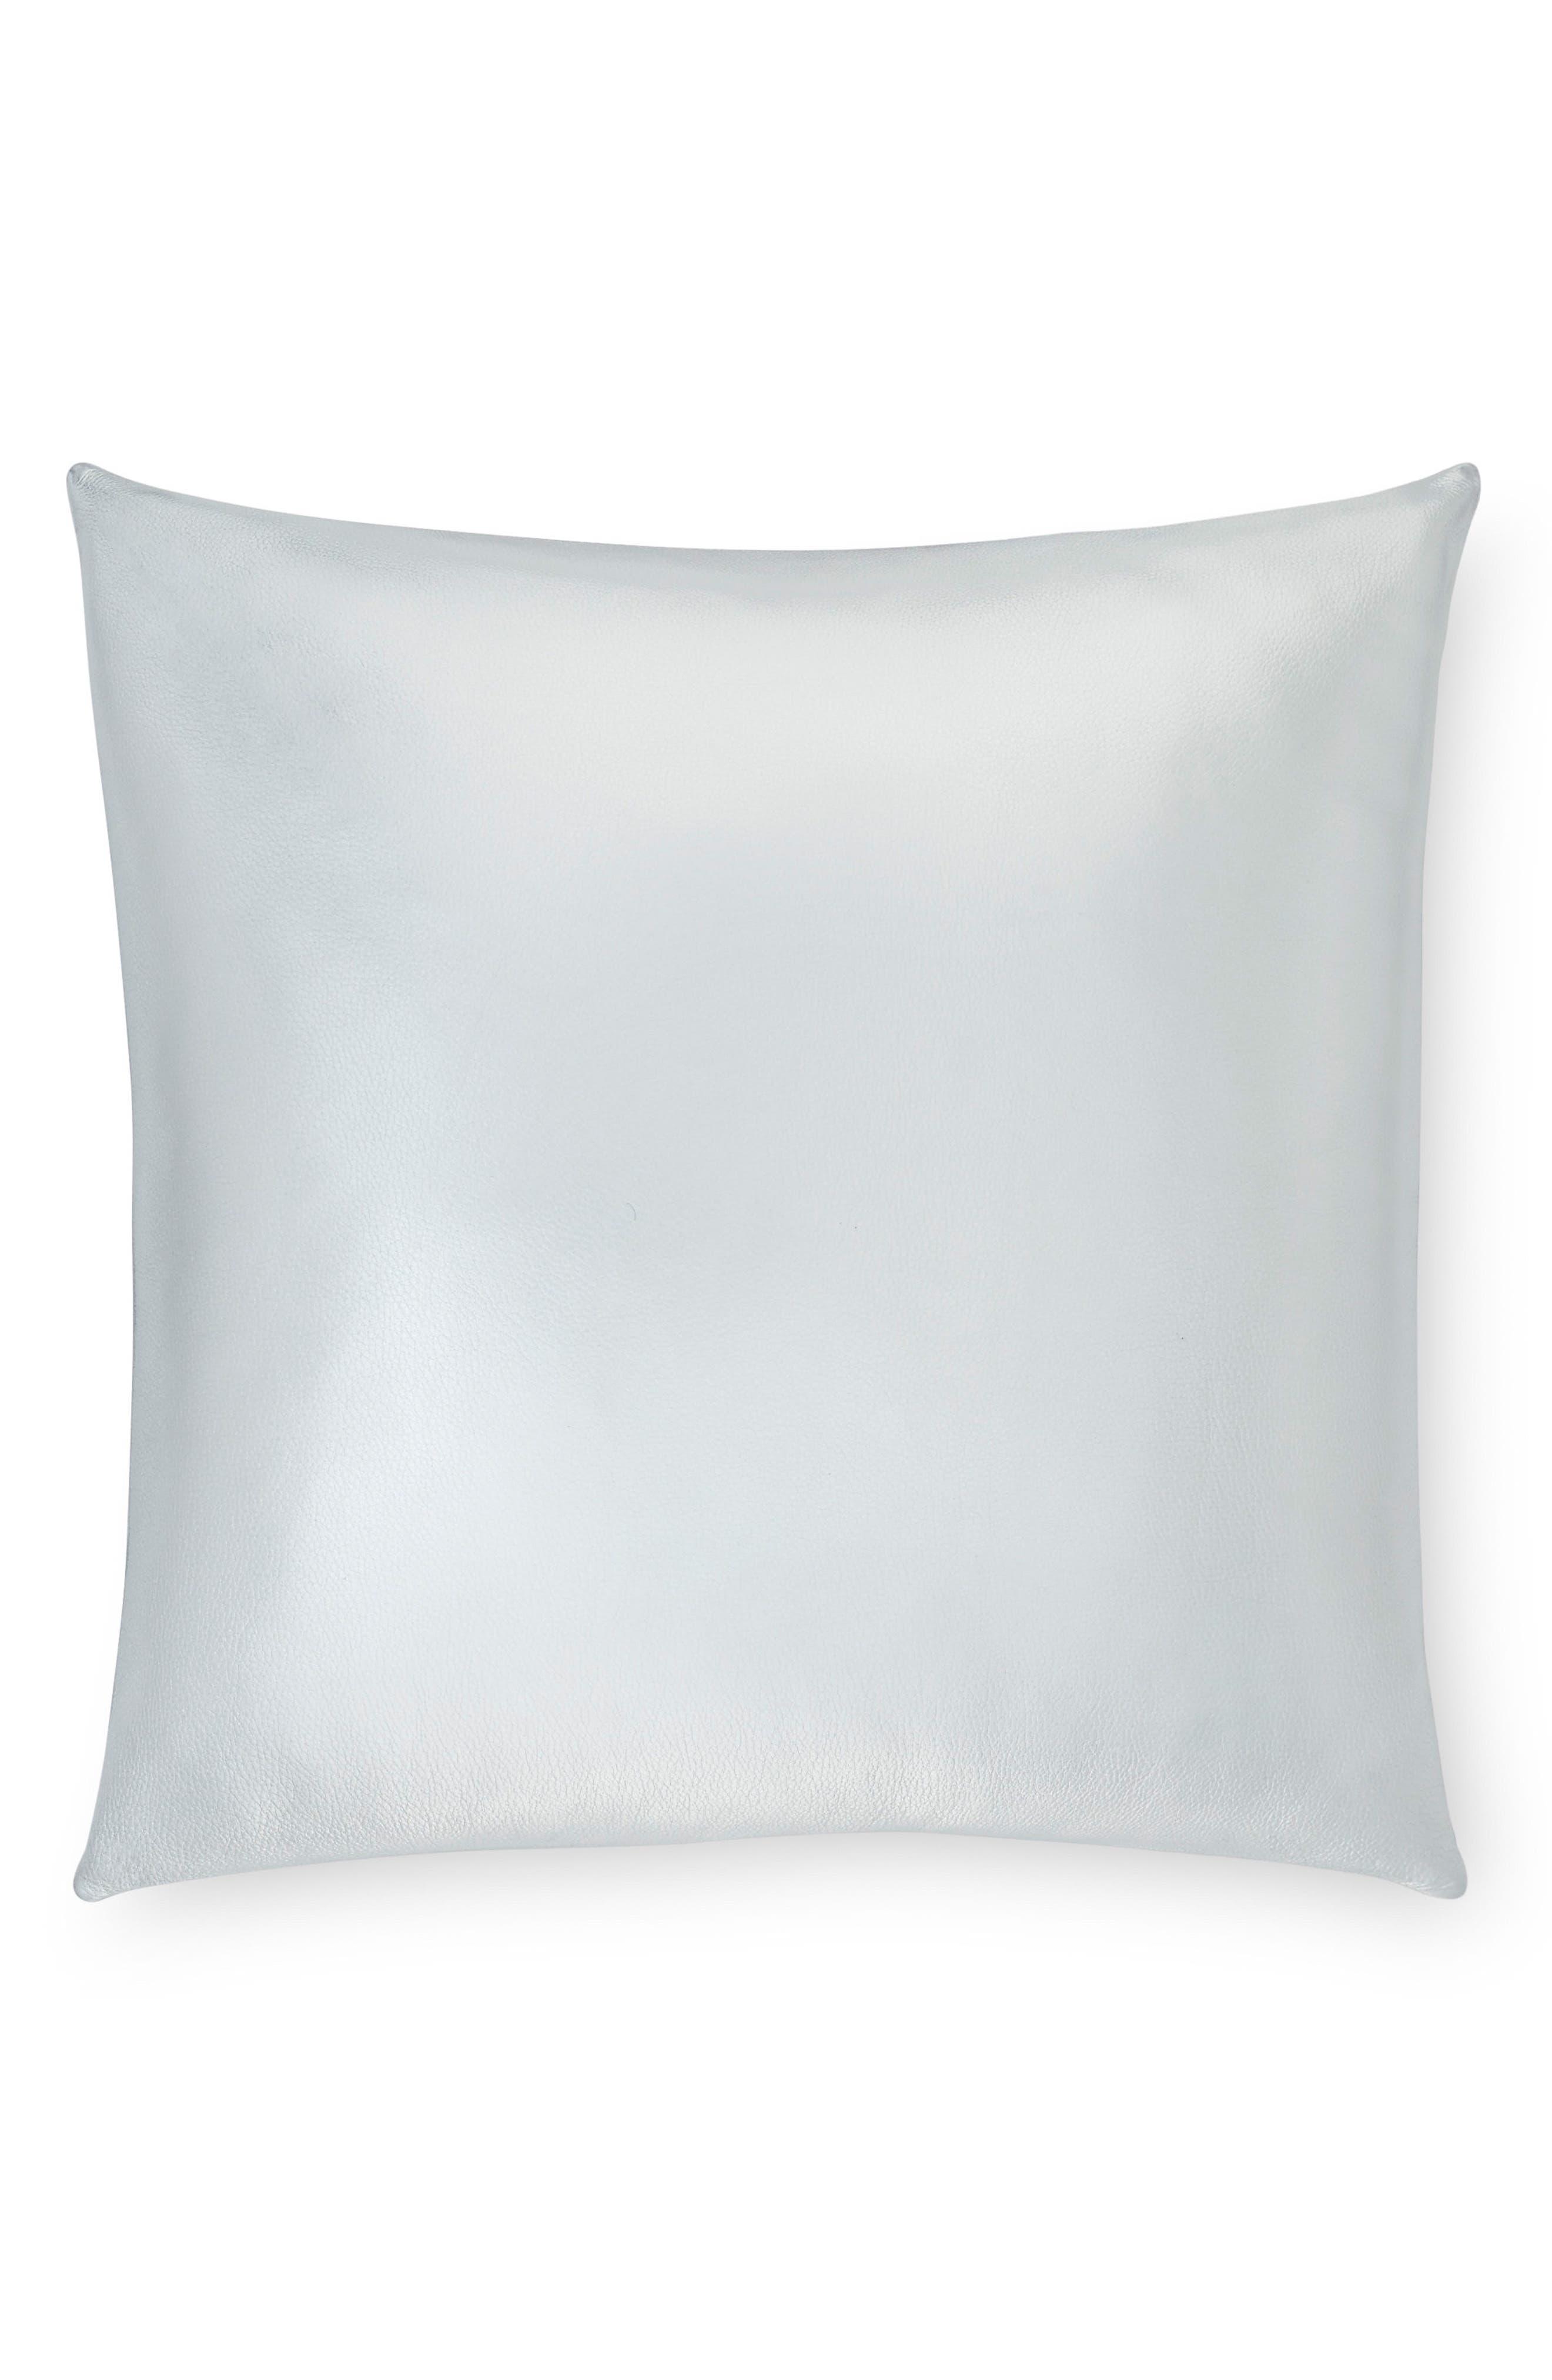 SFERRA Satta Leather Accent Pillow